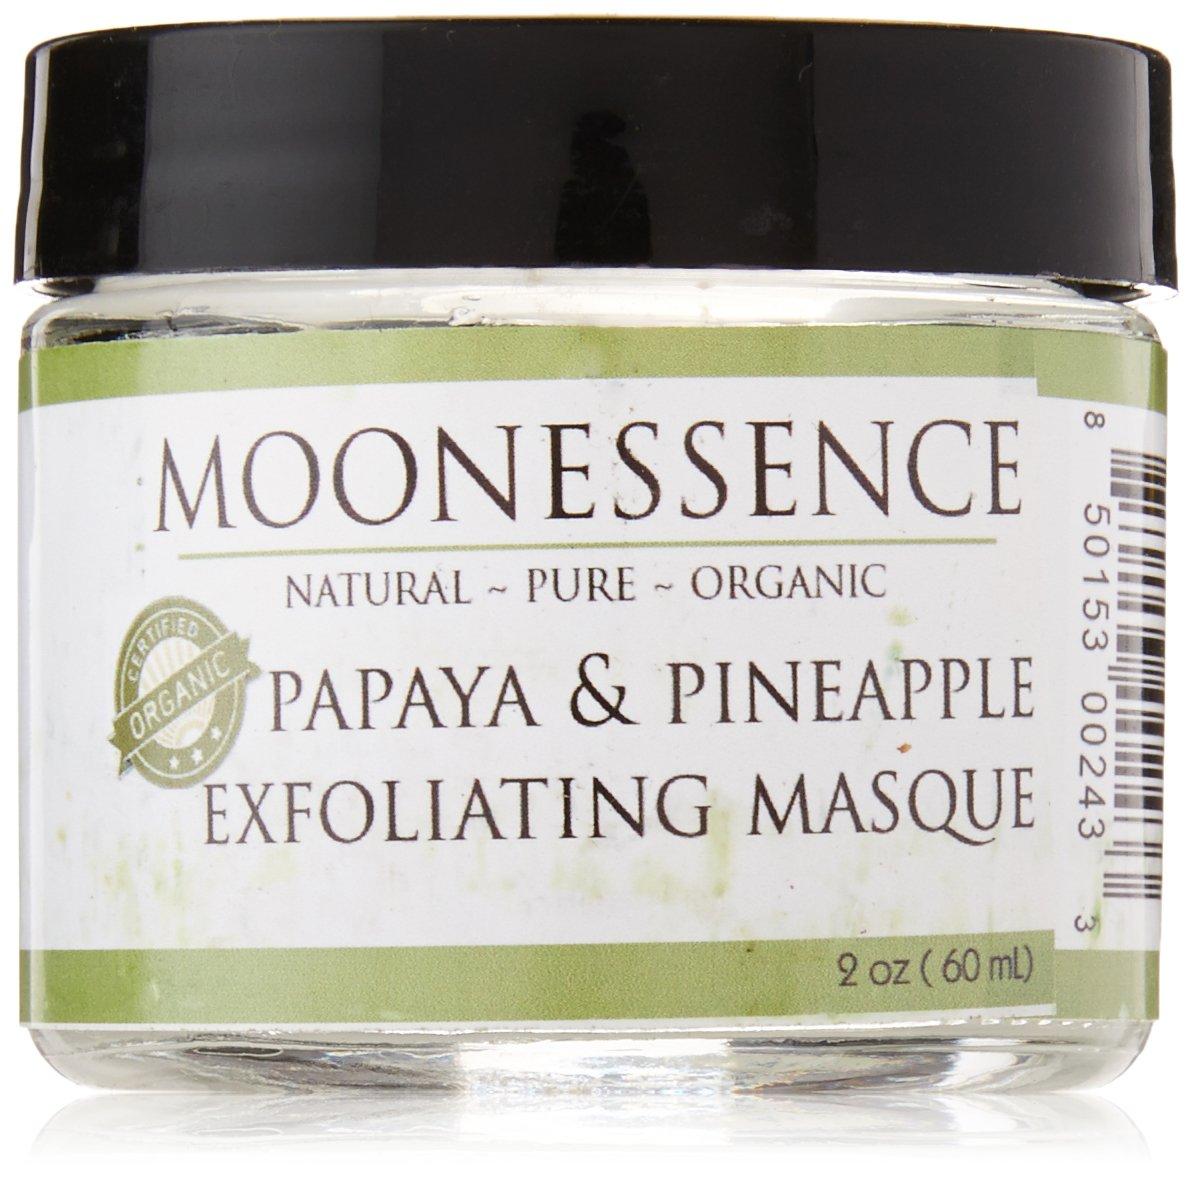 Amazon.com: moonessence Facial Scrub, Papaya Enzima de piña ...